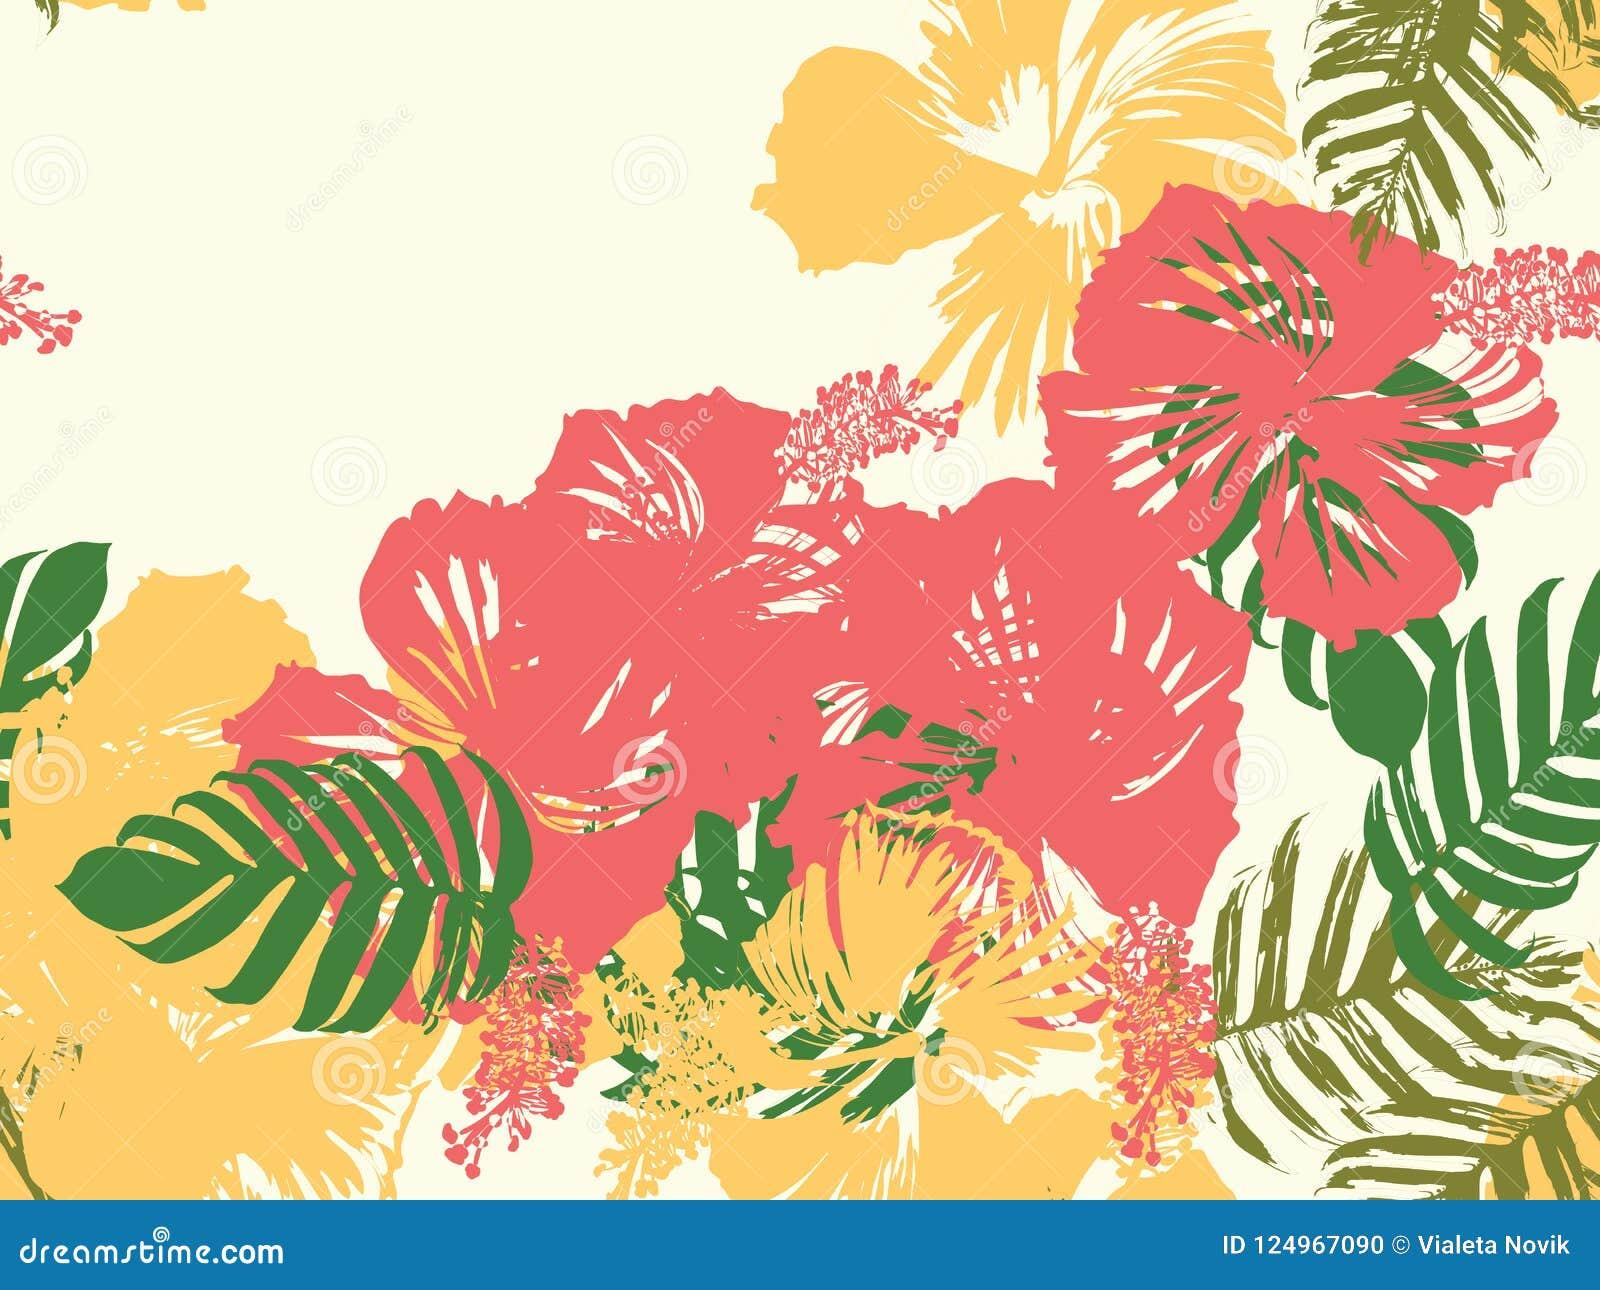 Hawaiian exotic cover template stock vector illustration of download hawaiian exotic cover template stock vector illustration of flower beach 124967090 izmirmasajfo